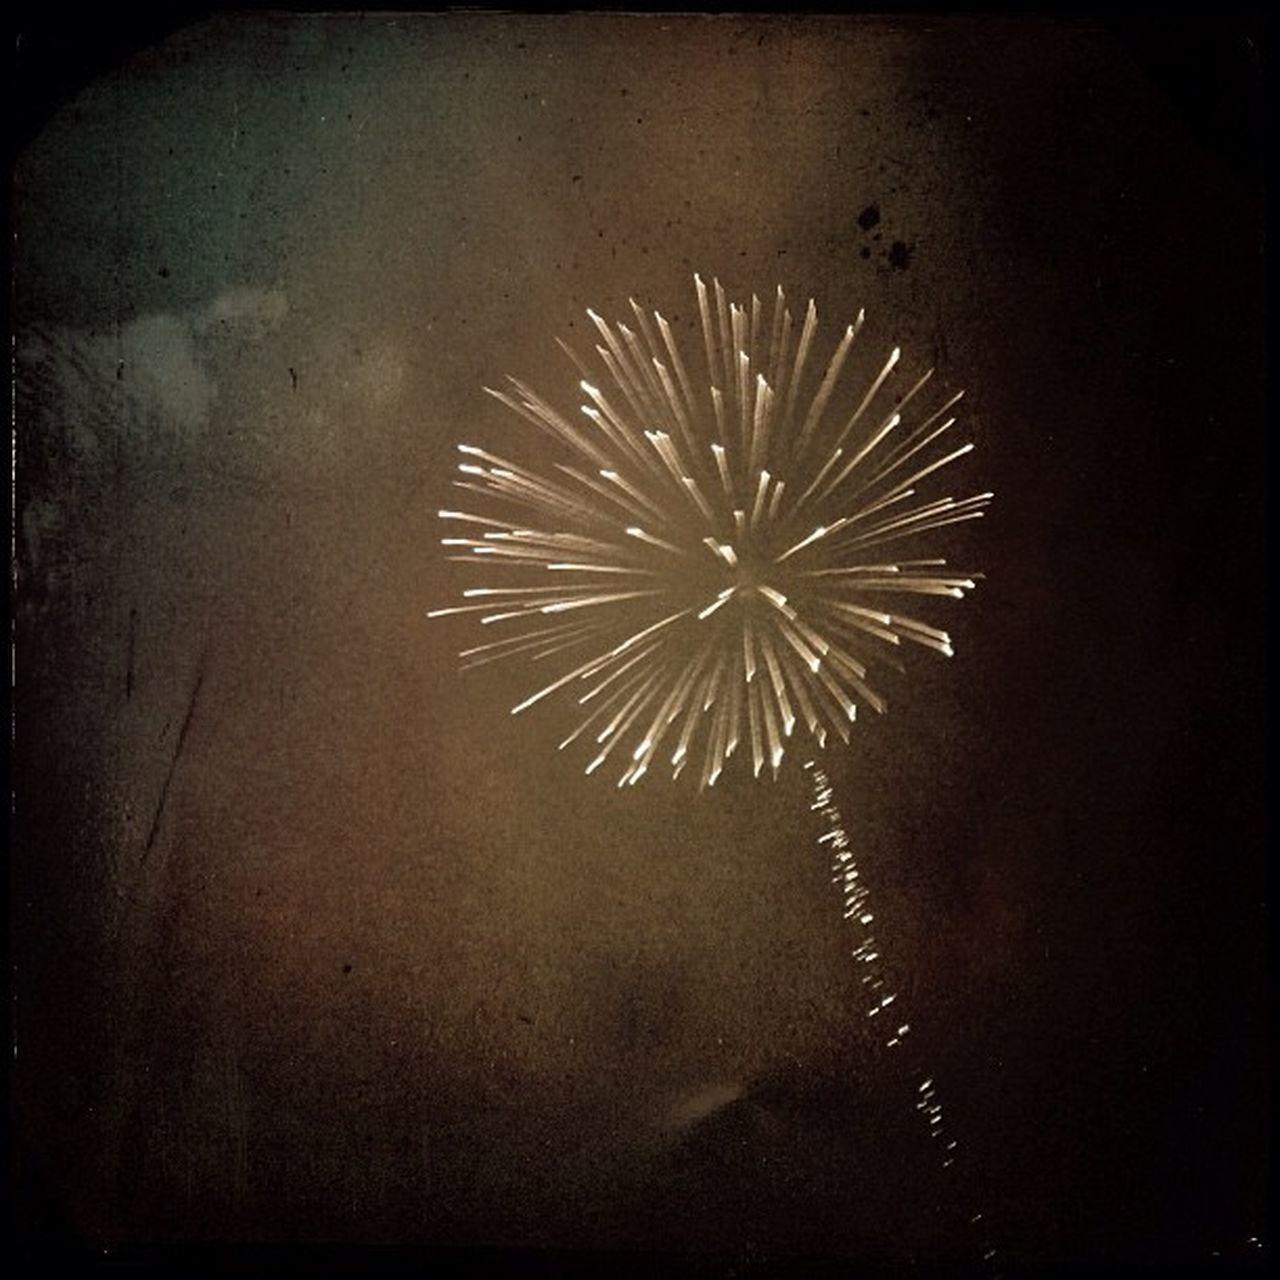 firework - man made object, firework display, night, no people, celebration, firework, outdoors